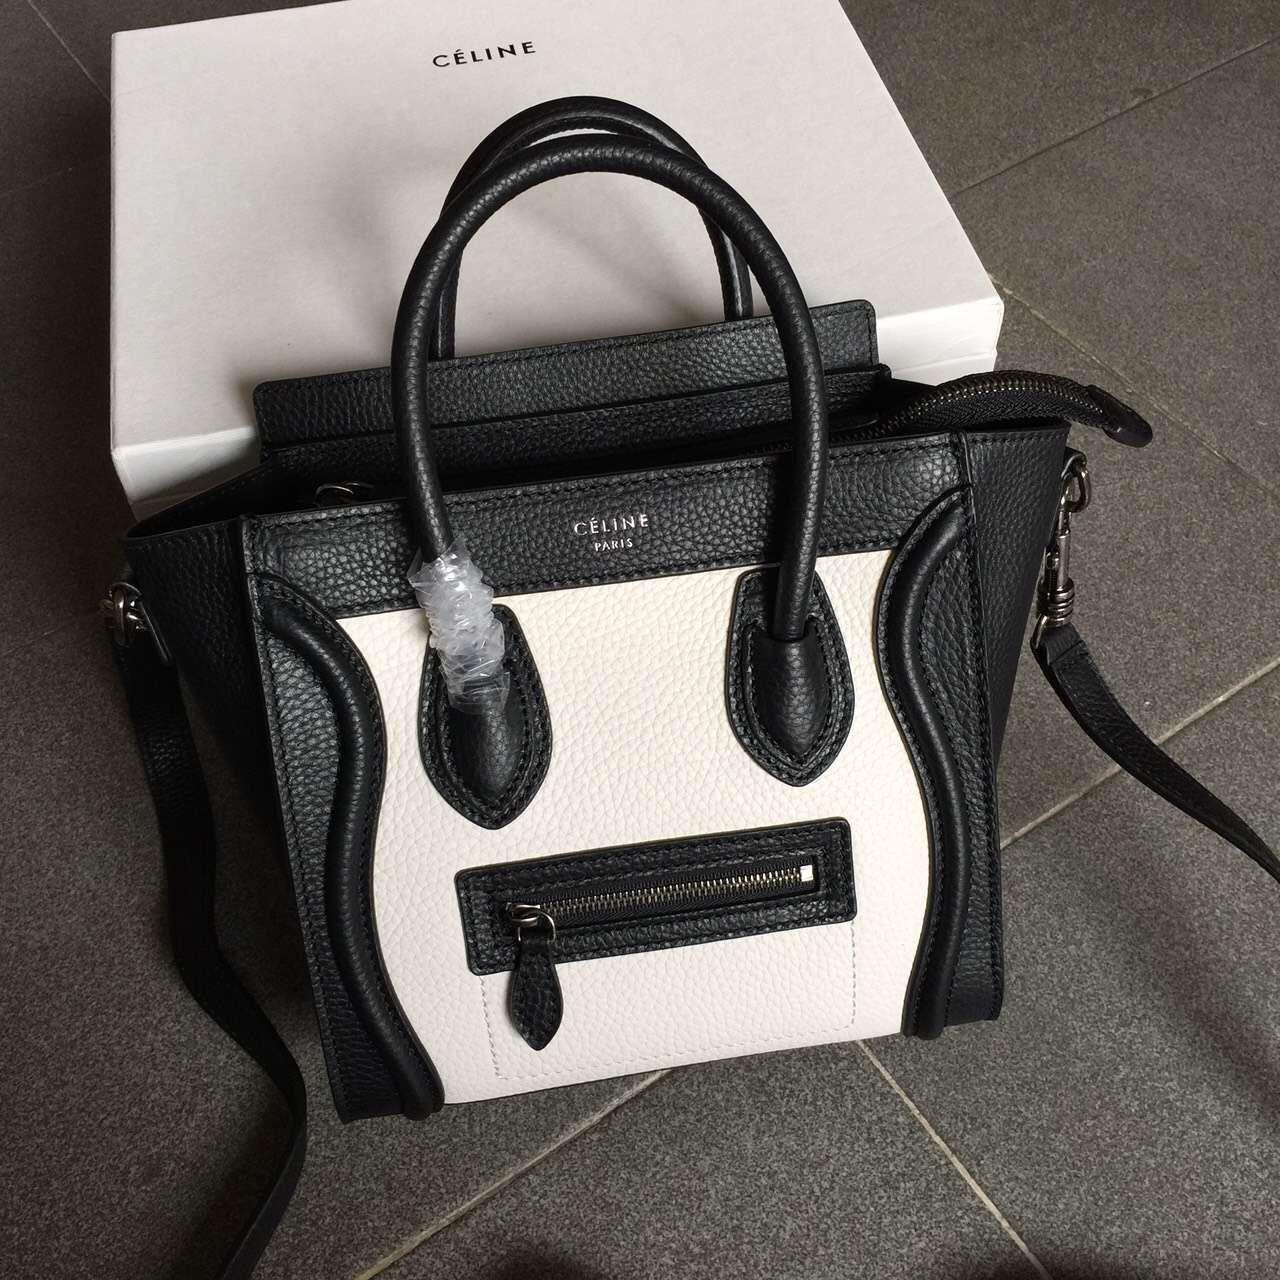 e62f1b8a2b Celine Two-tone Nano Luggage in Grainy Calfskin Black White